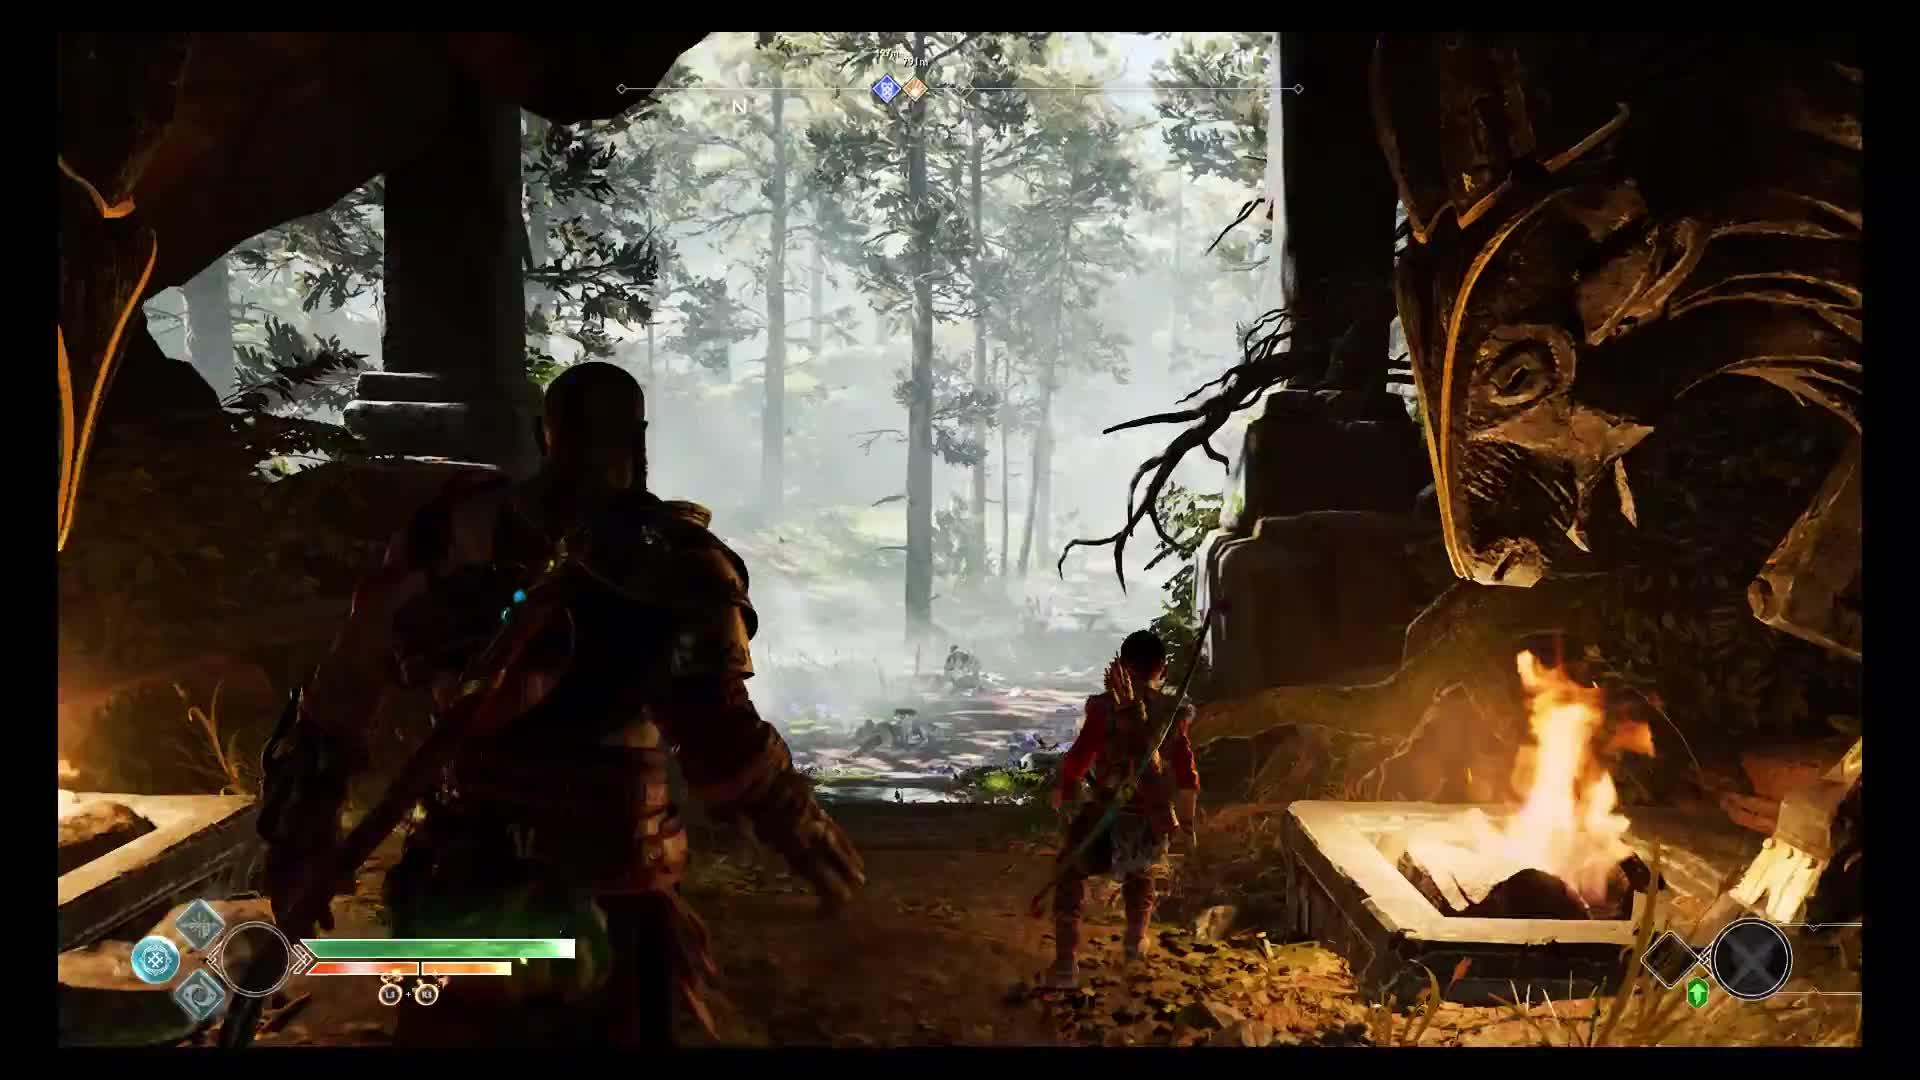 Gaming, RichJamez, godofwar, ps4pro, God of War - Forest Ancient Boss Fight GIFs